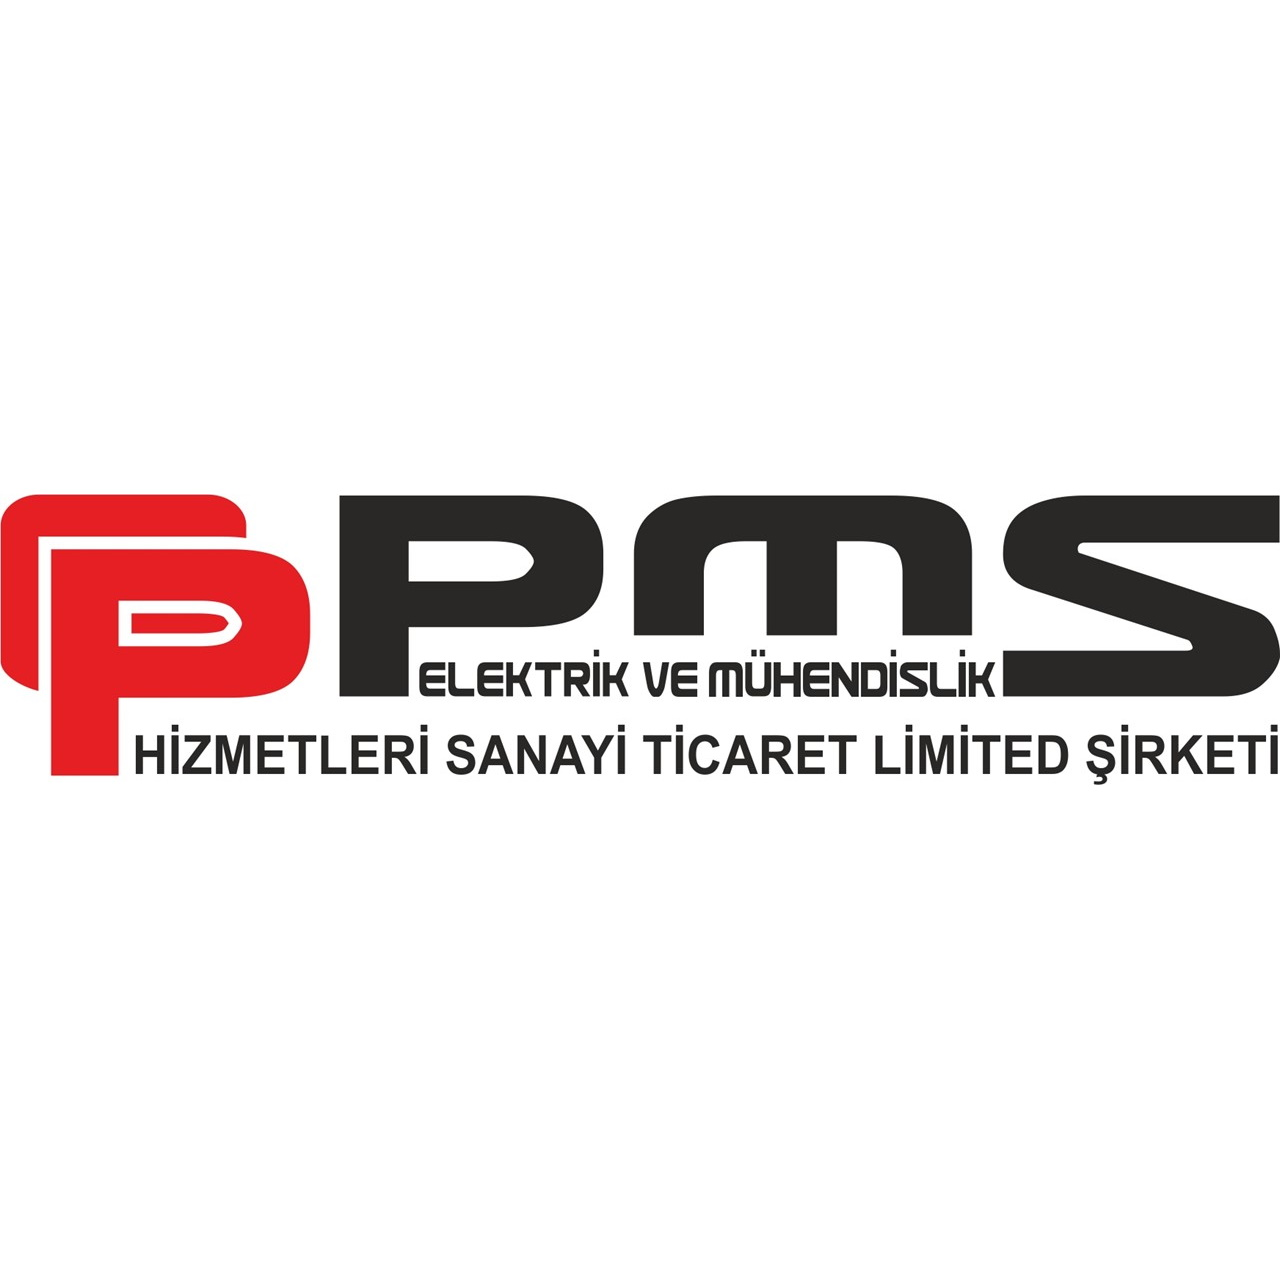 PMS ELEKTRIK VE MUHENDISLIK LTD. STI.